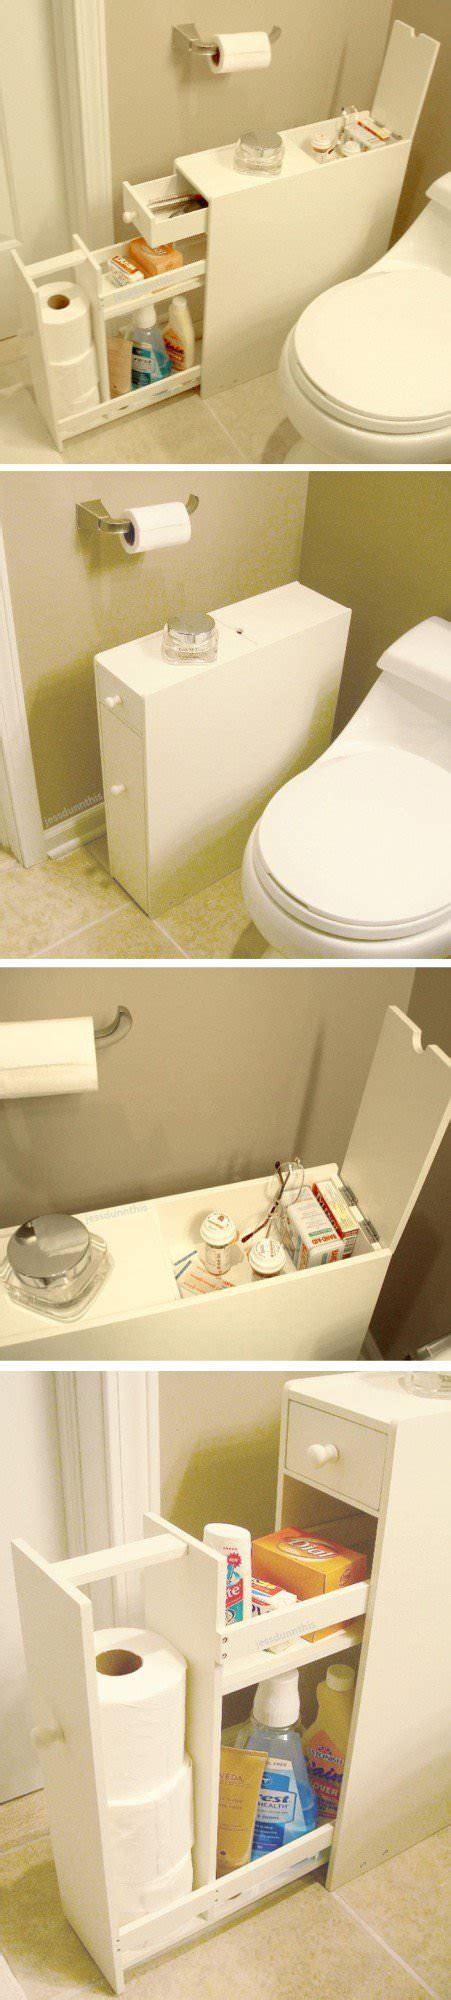 Diy Small Bathroom Storage Ideas by Top 25 The Best Diy Small Bathroom Storage Ideas That Will